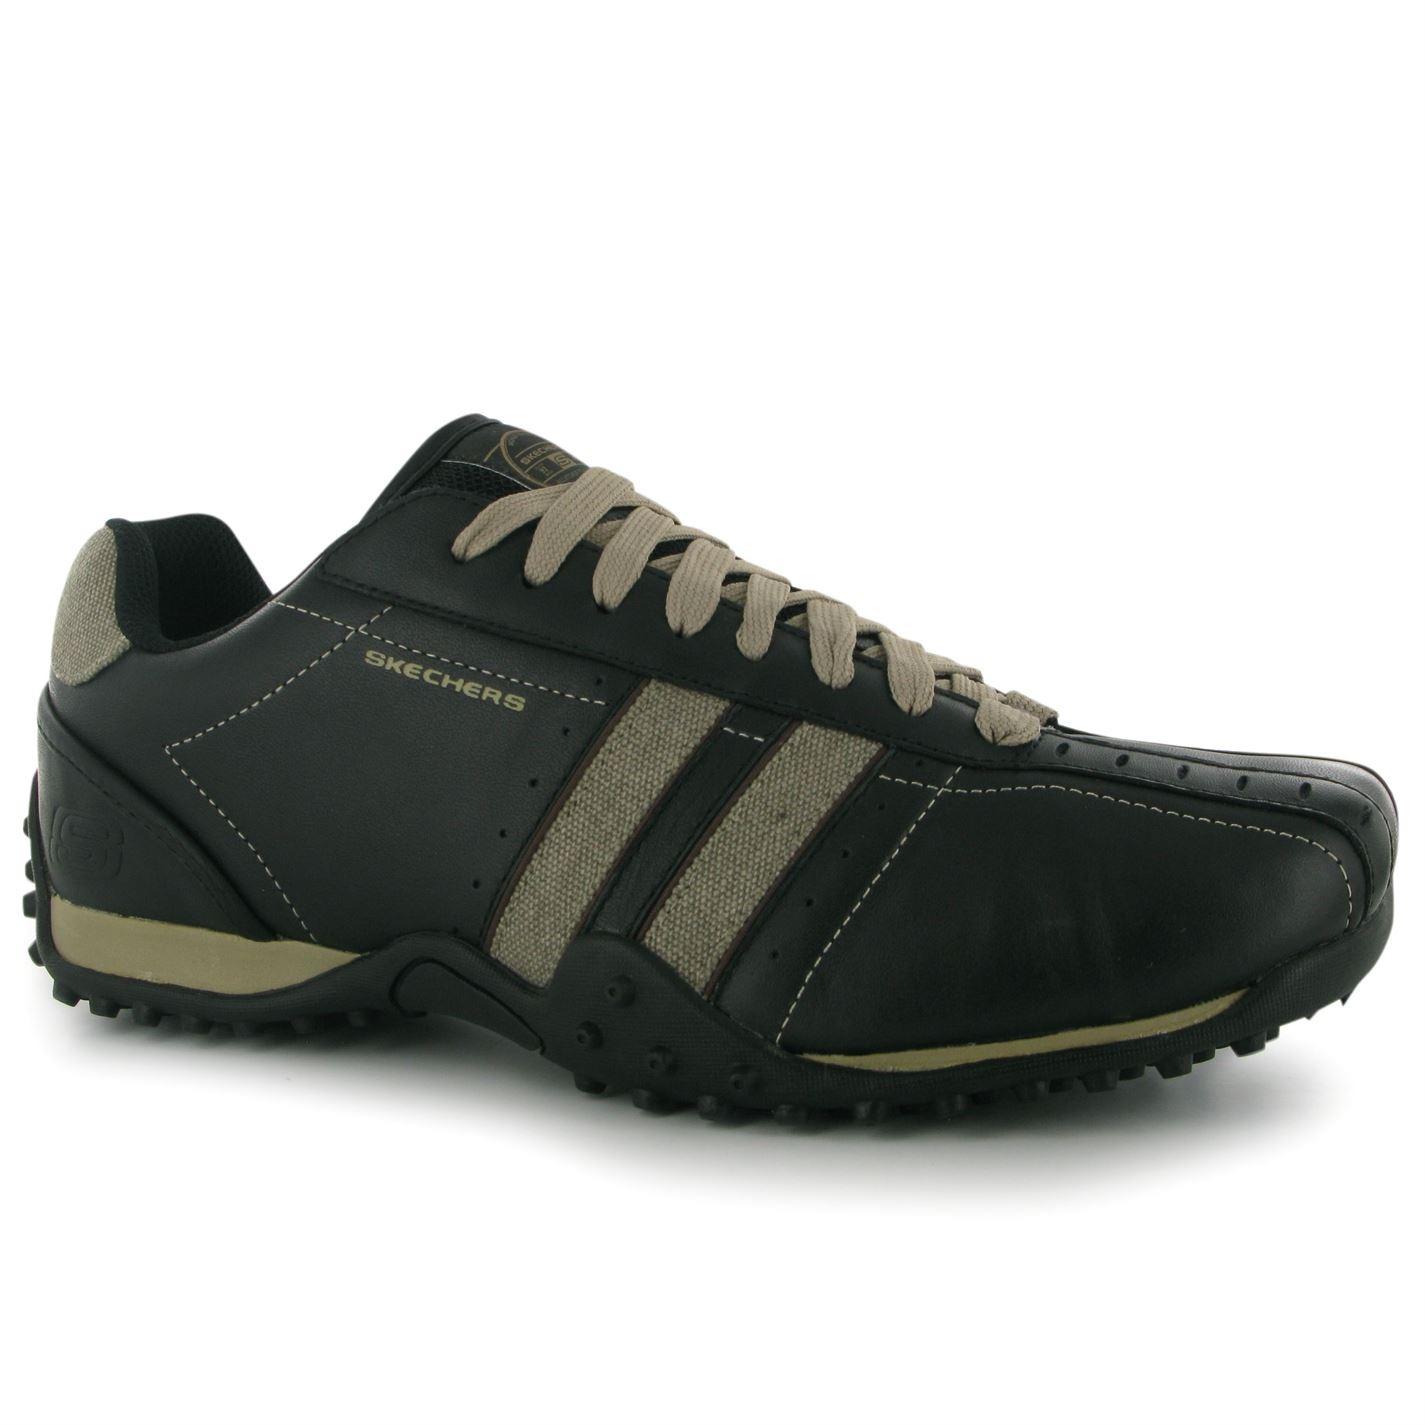 47f5db2f7f9c Pánske Čierne Topánky Urbs. Loading zoom